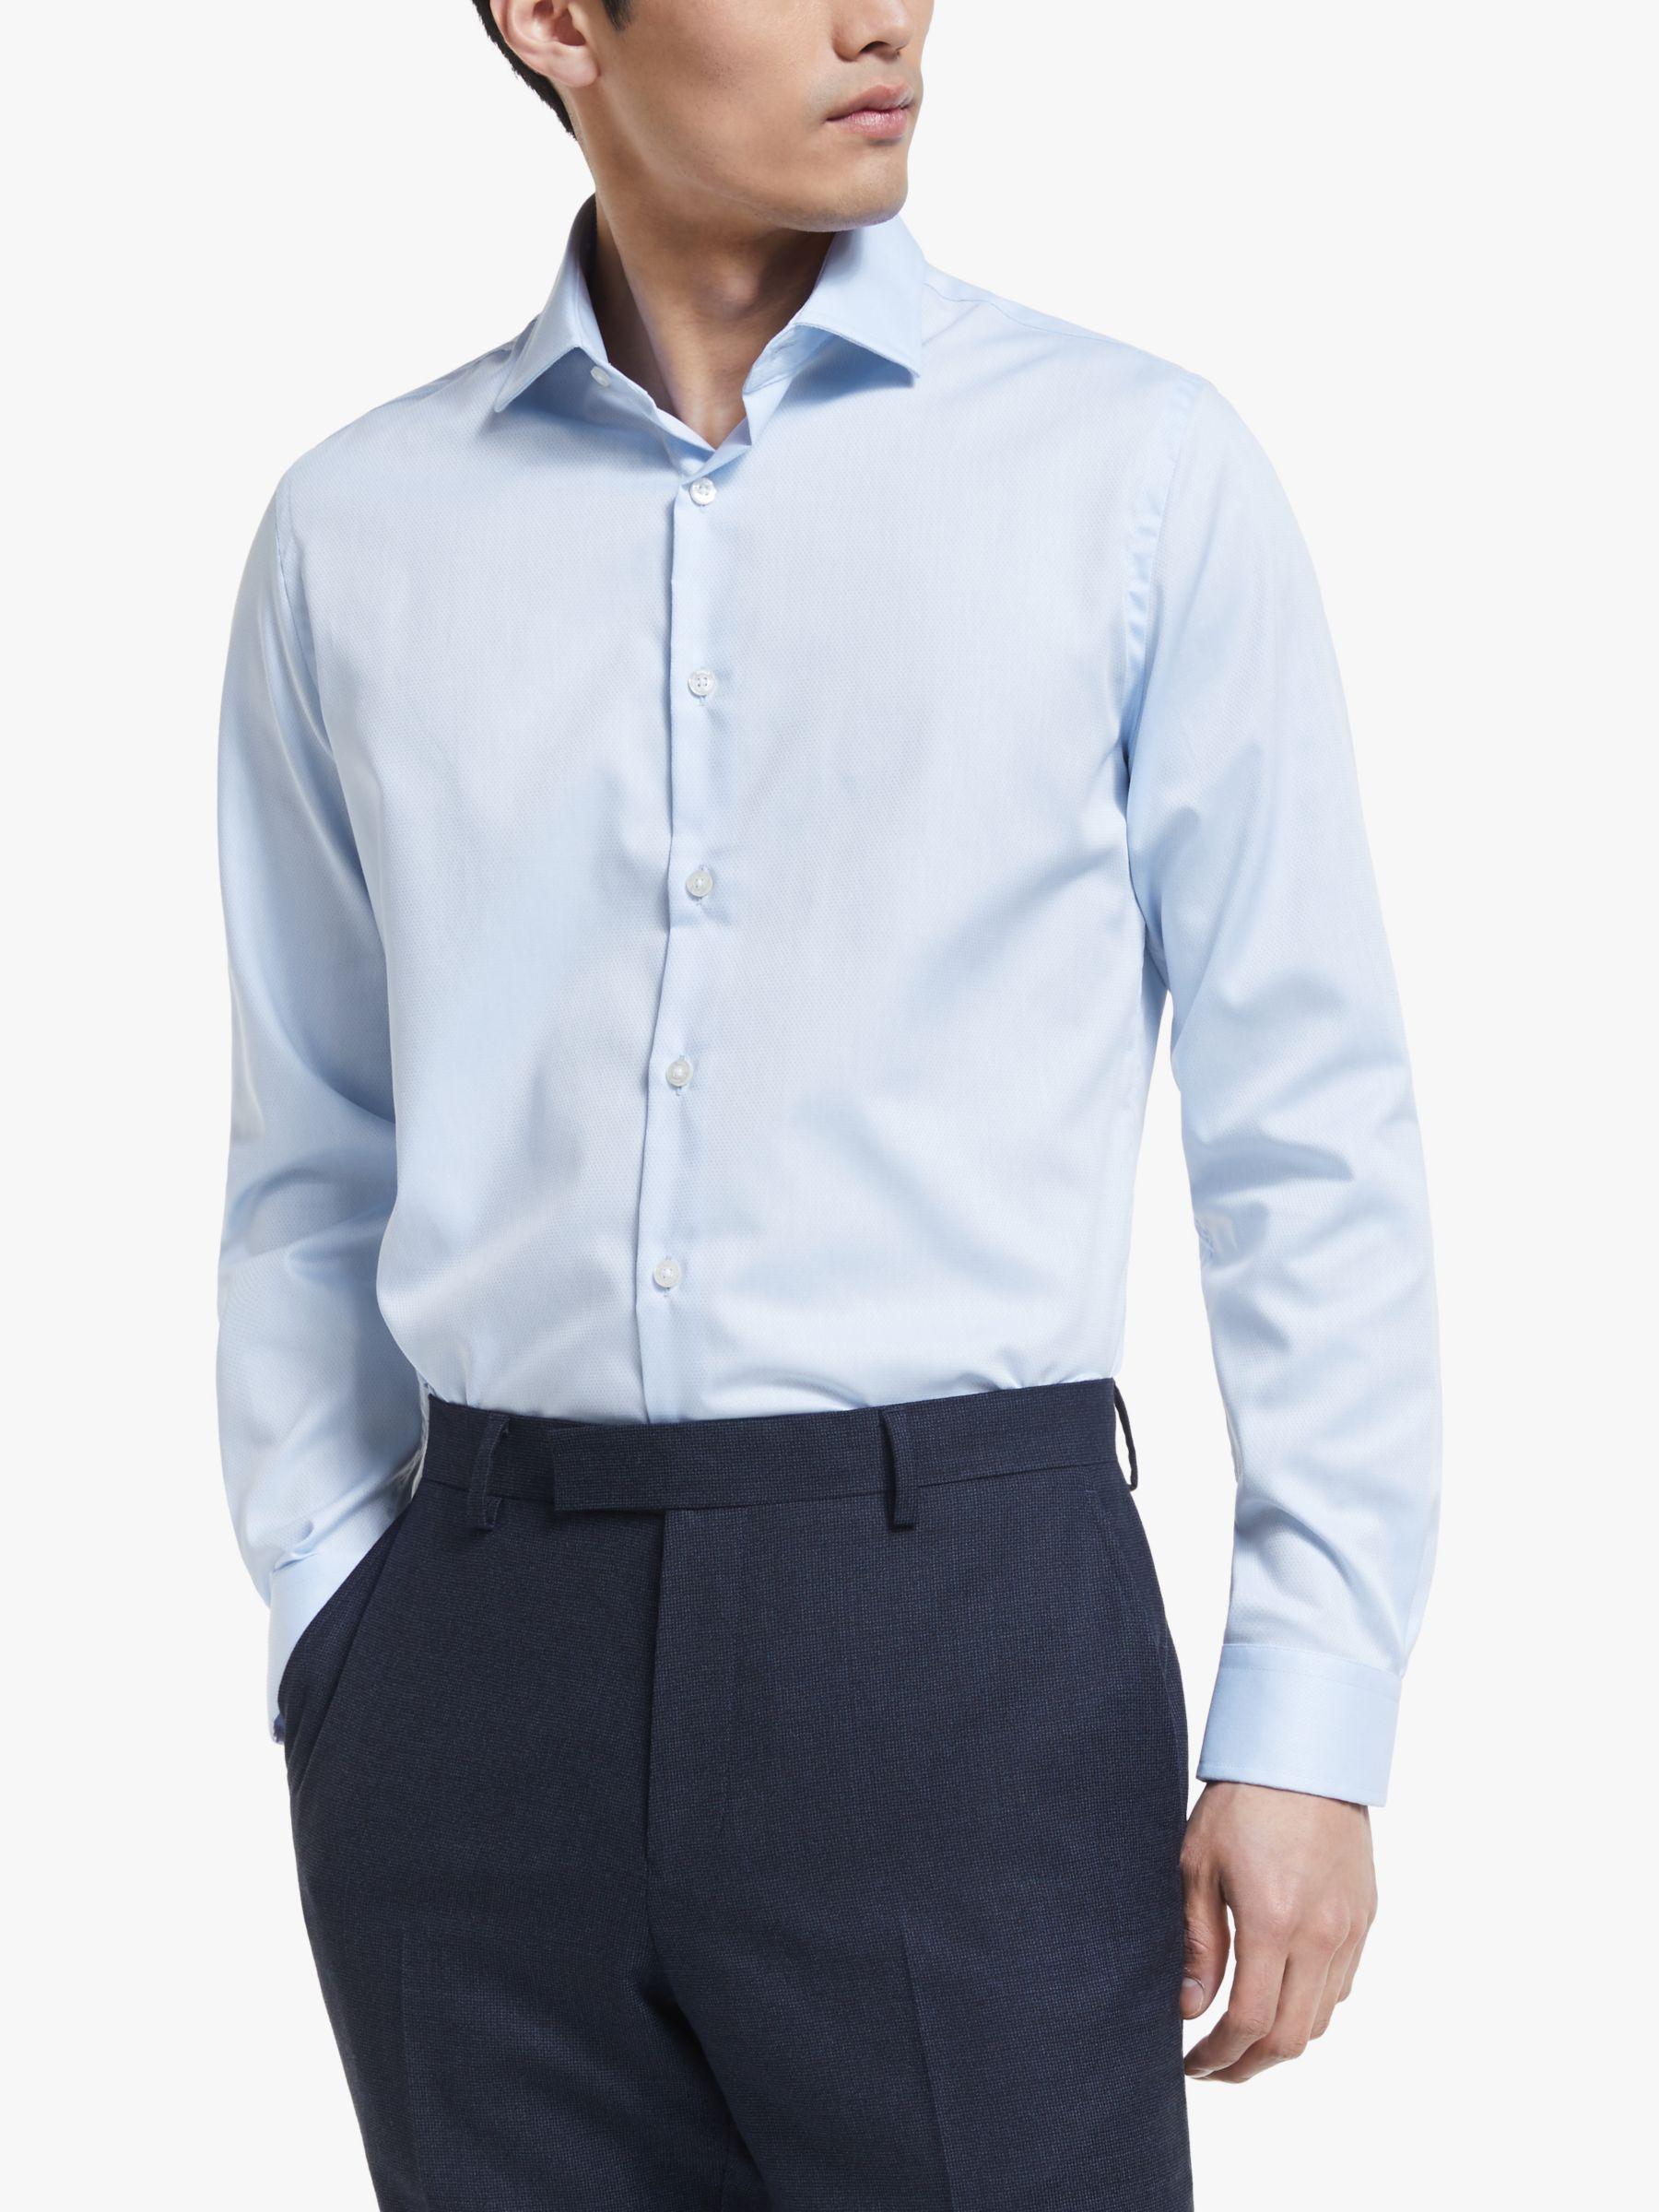 Richard James Mayfair Richard James Mayfair Dashed Twill Shirt, Blue